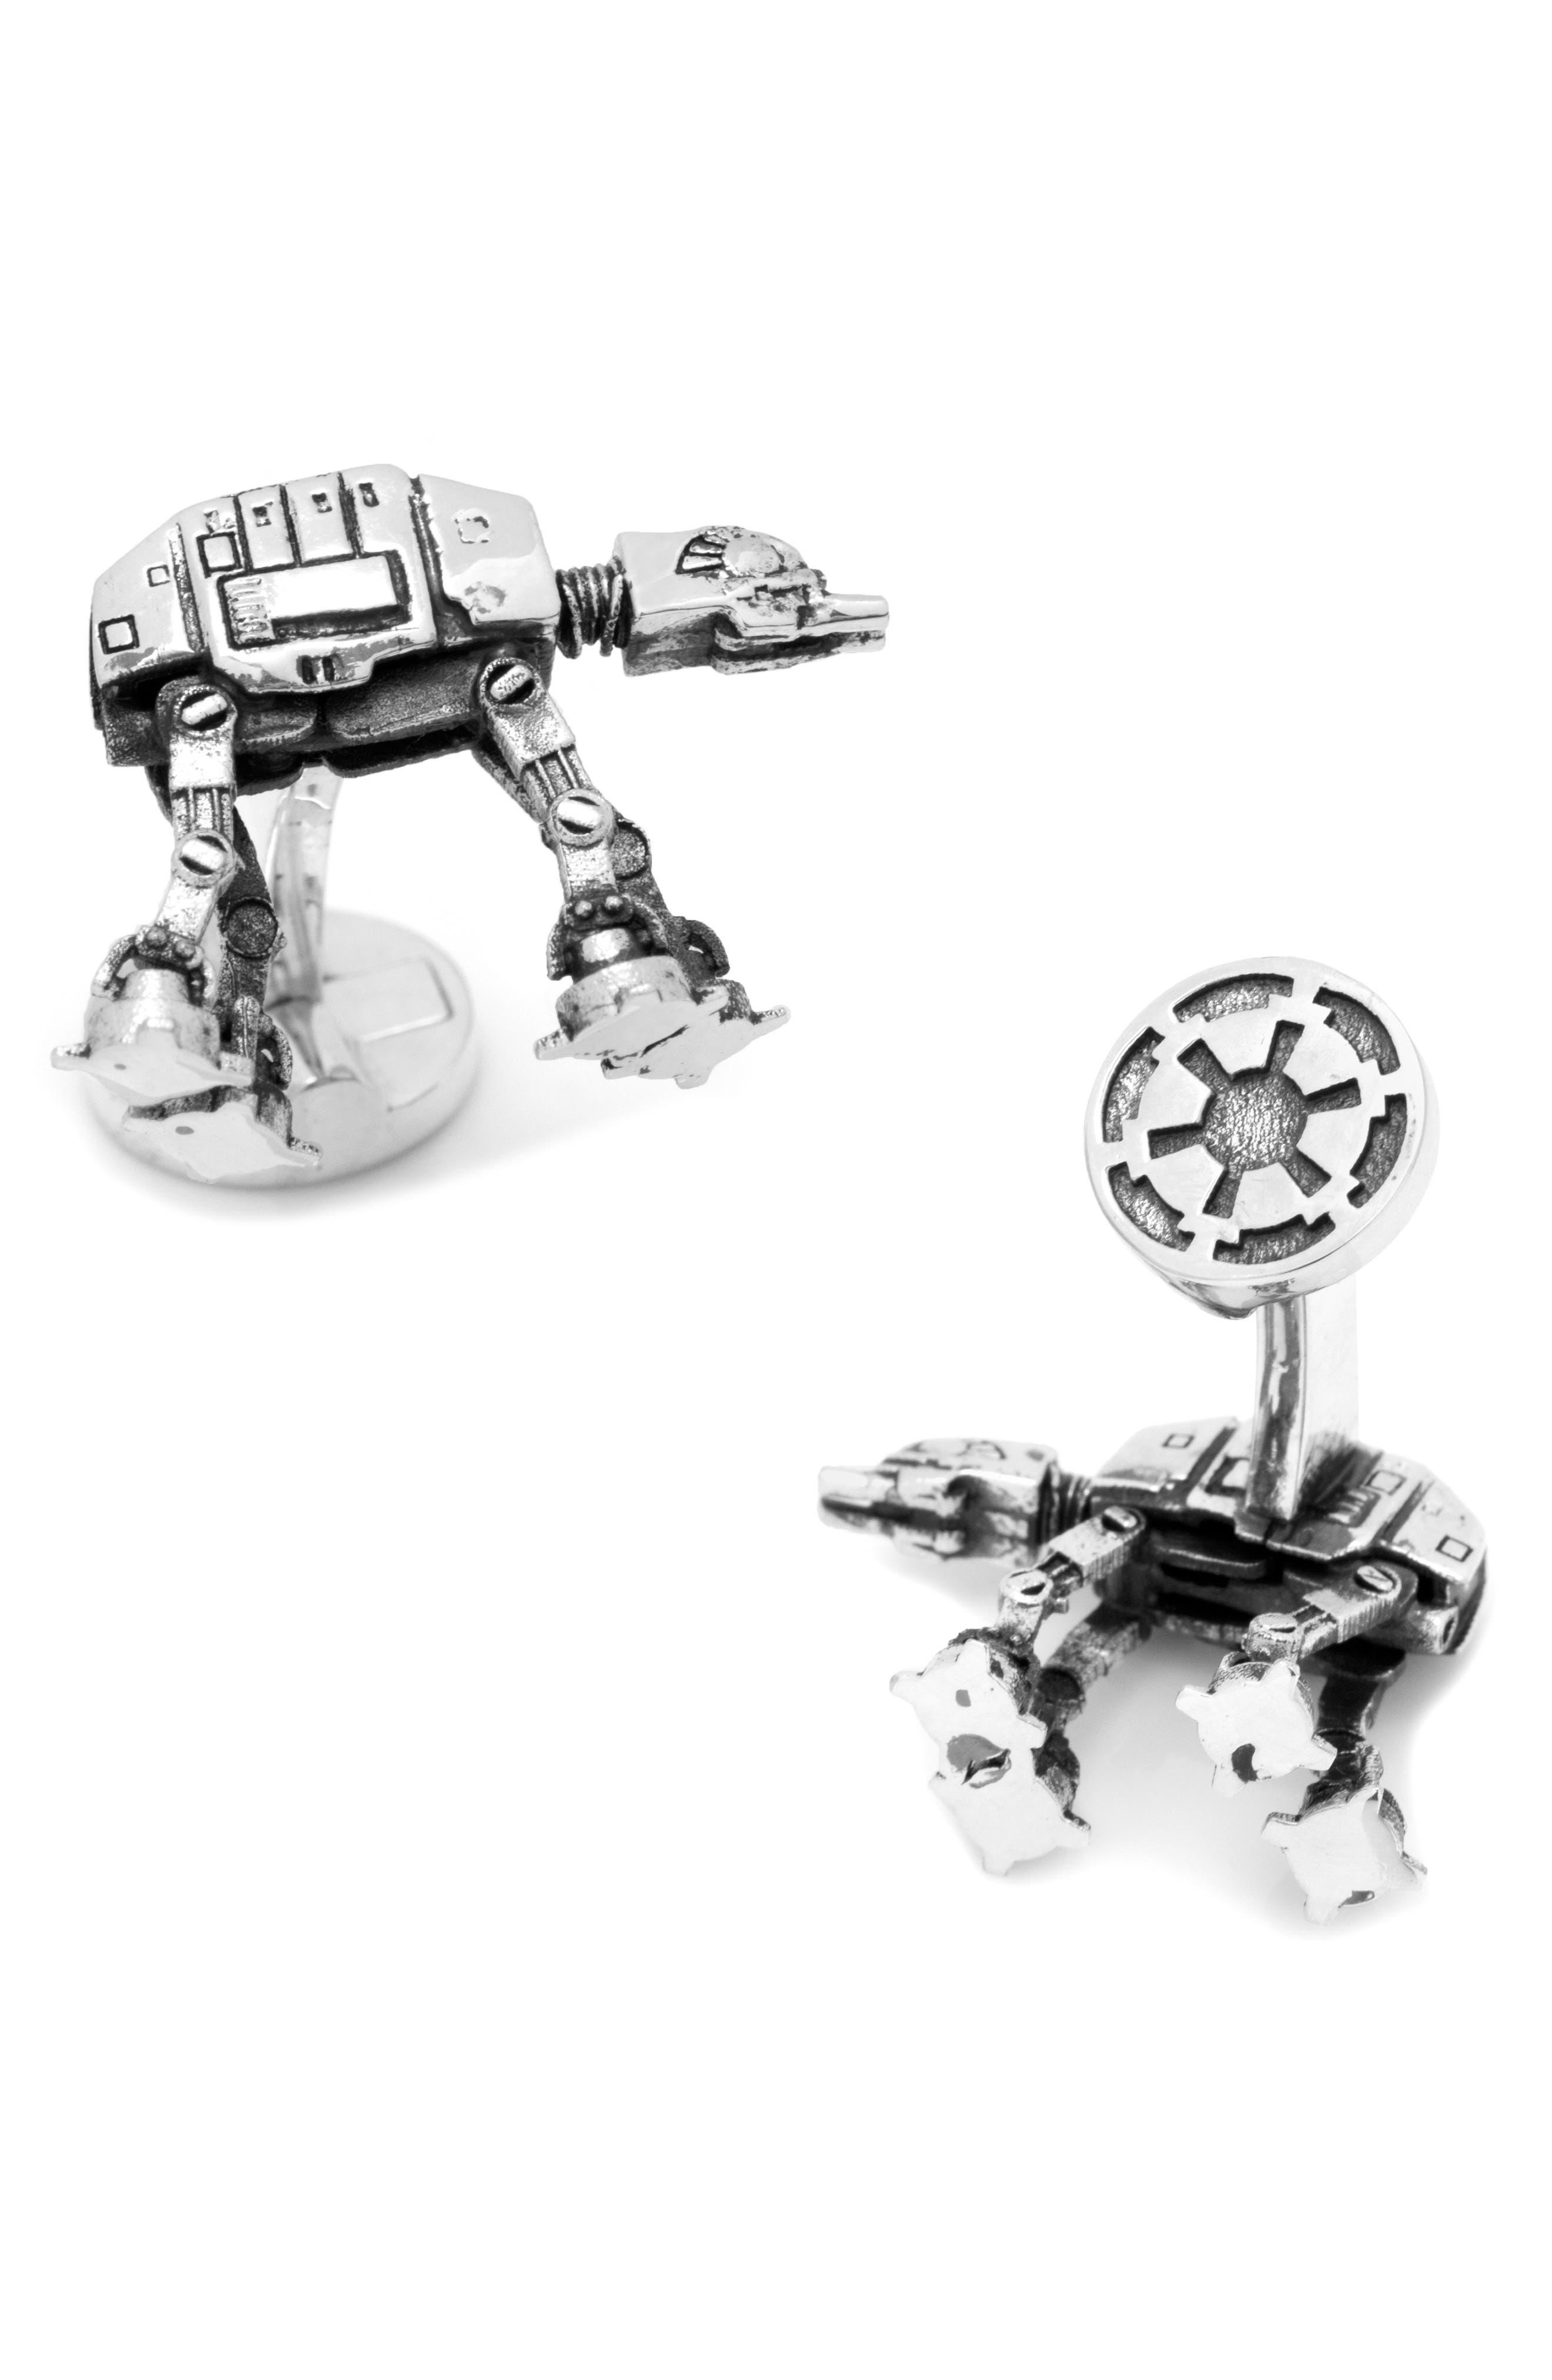 Star Wars<sup>™</sup> AT-AT Walker 3D Cuff Links,                         Main,                         color, Silver